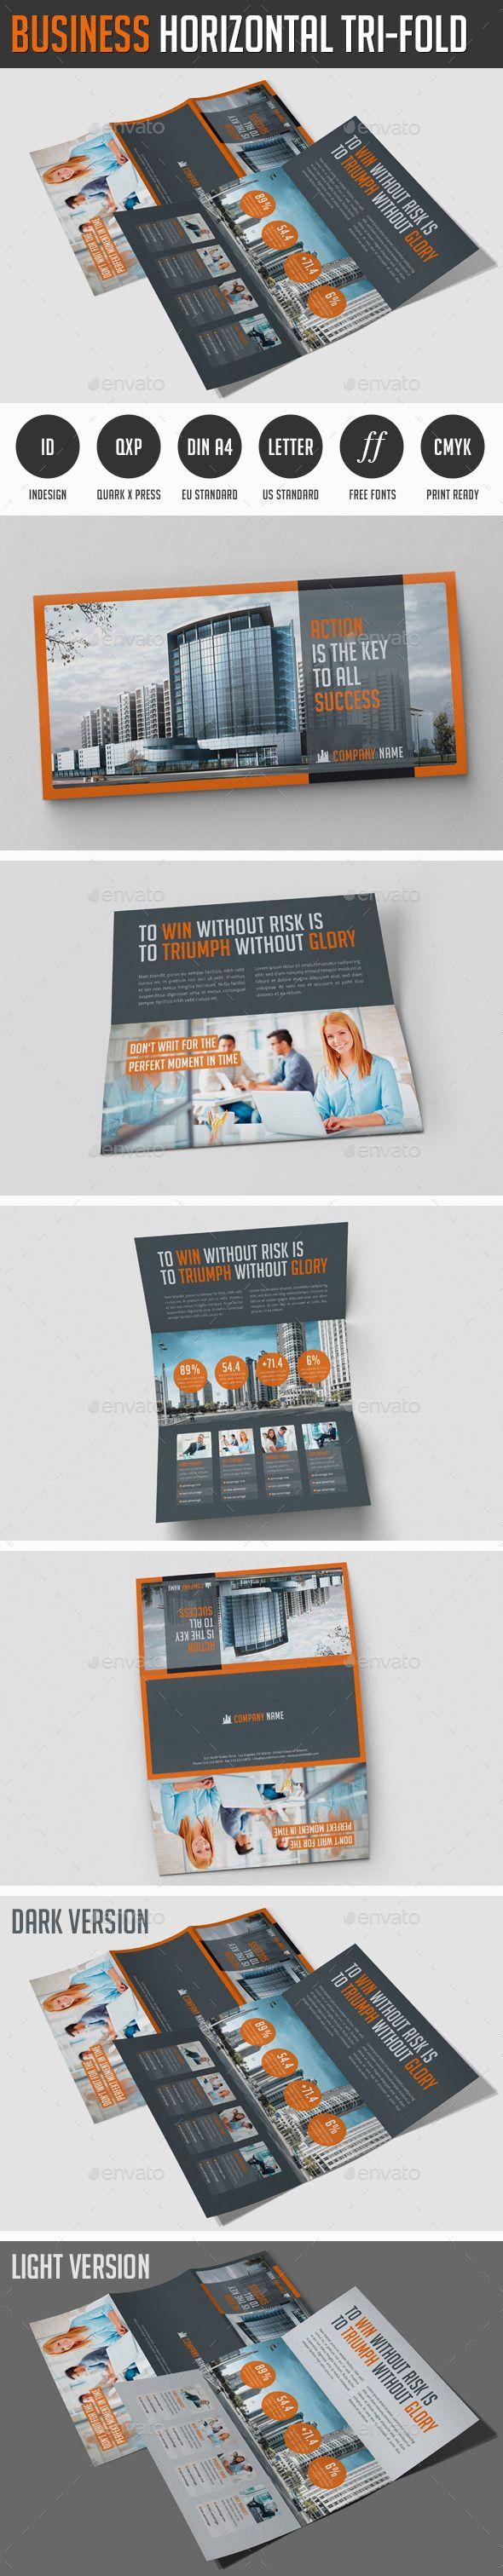 Best Direct Mail Postcards Images On Pinterest Postcard Design - Direct mail flyer template